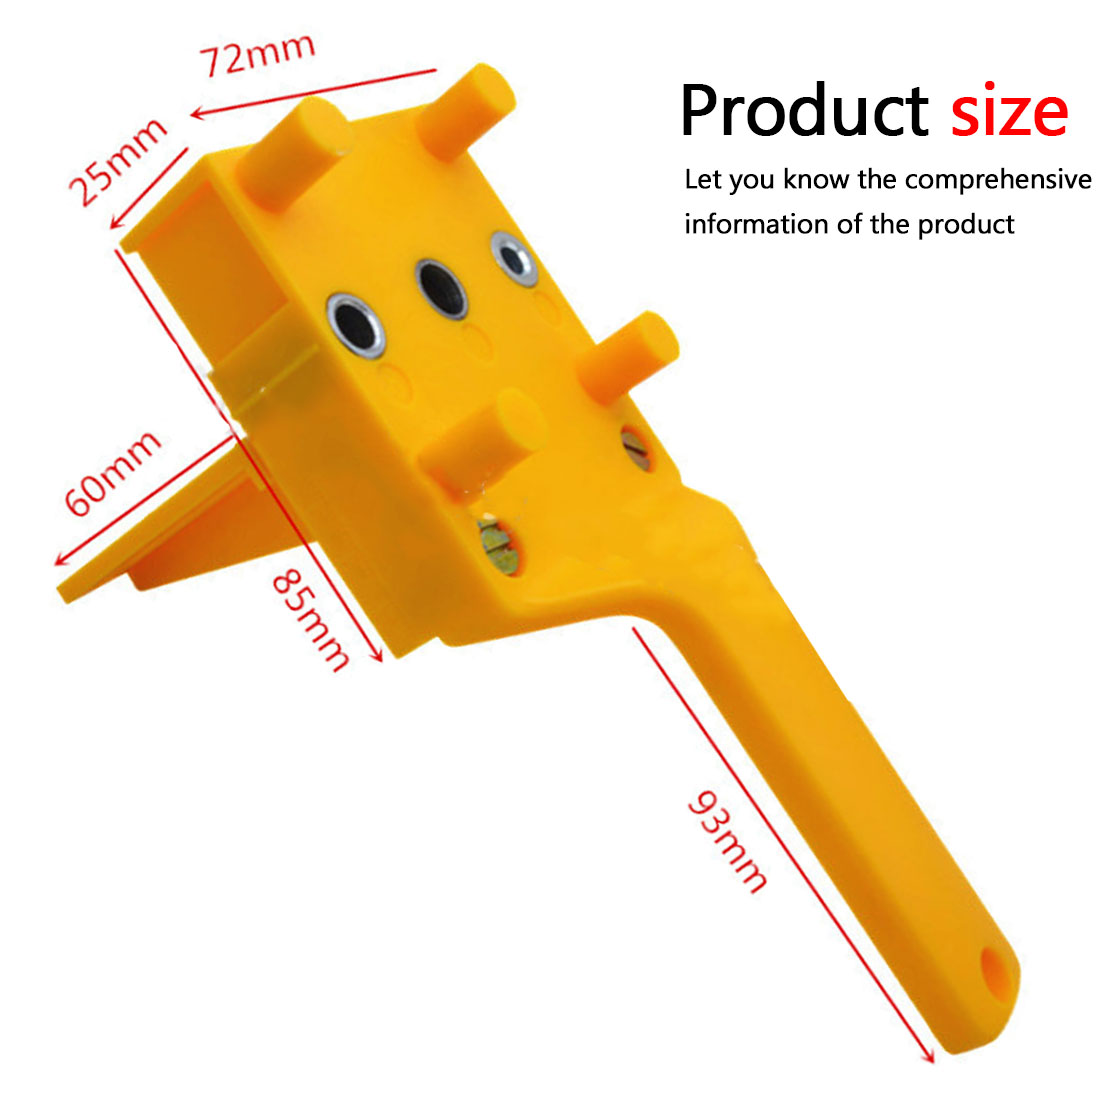 Doweling Jig 6/8/10mm Handheld Pocket Hole Jig Set Woodworking Wood Dowel Self Centering Puncher Drill Guide Locator Jig|Hand Tool Sets| |  - title=